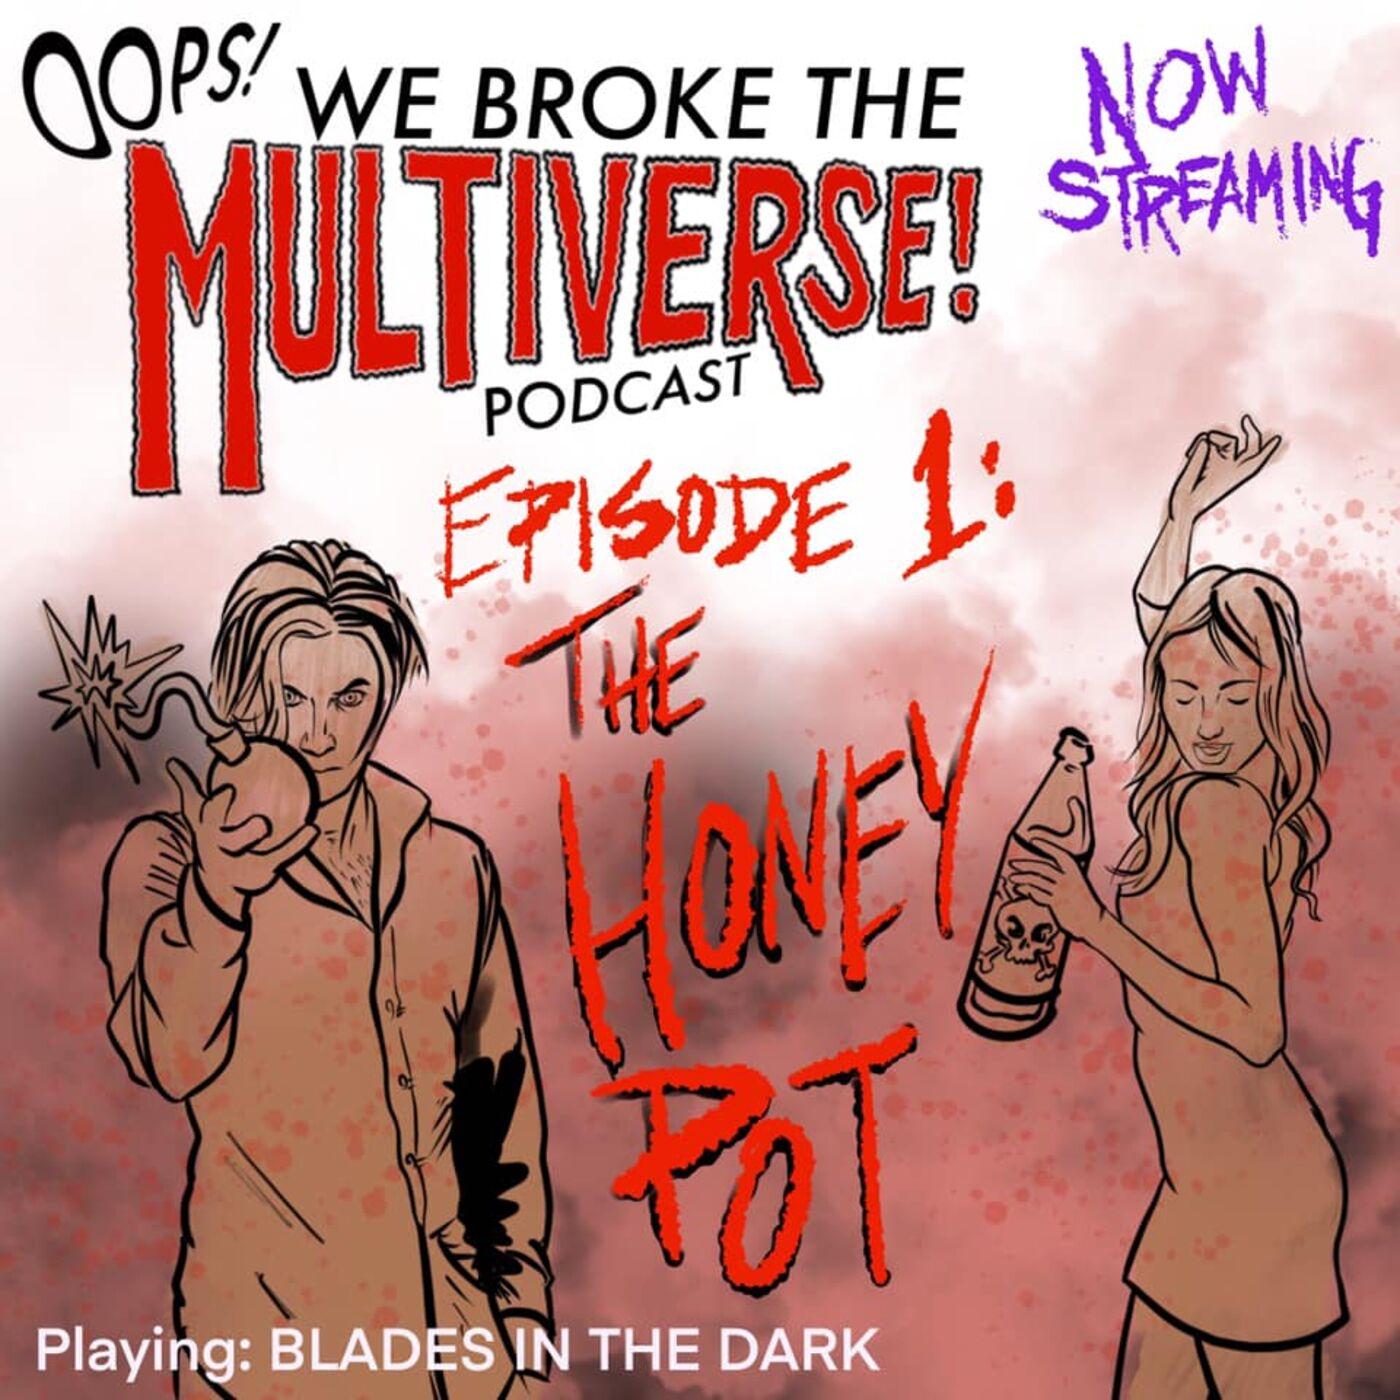 Episode 1 - The Honey Pot